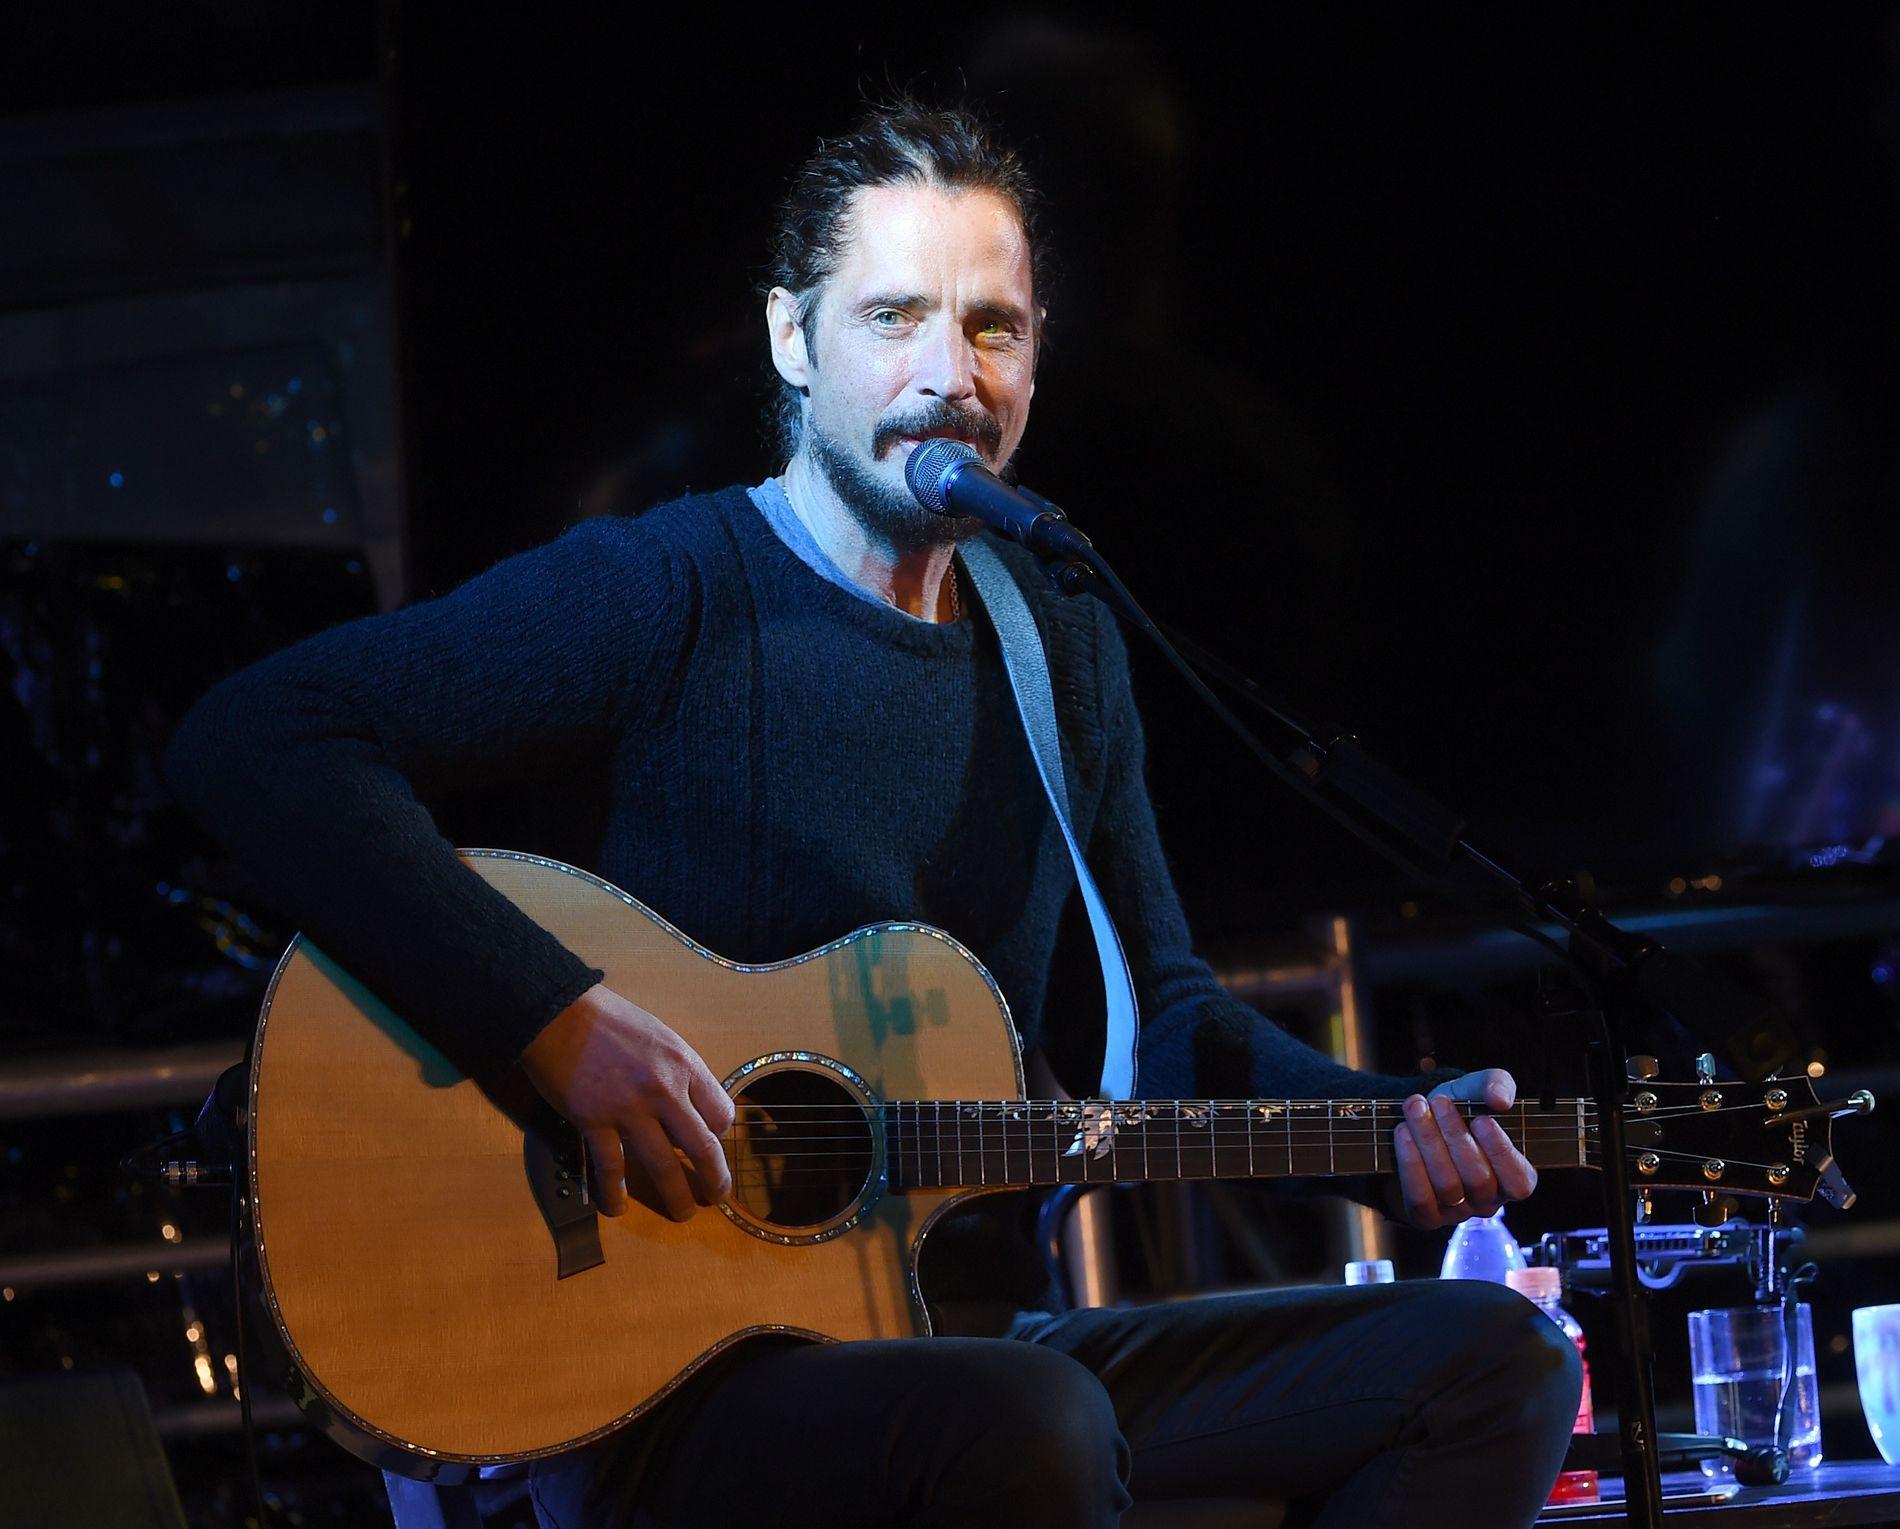 JANUAR: Chris Cornell på scenen i Malibu i januar i år.